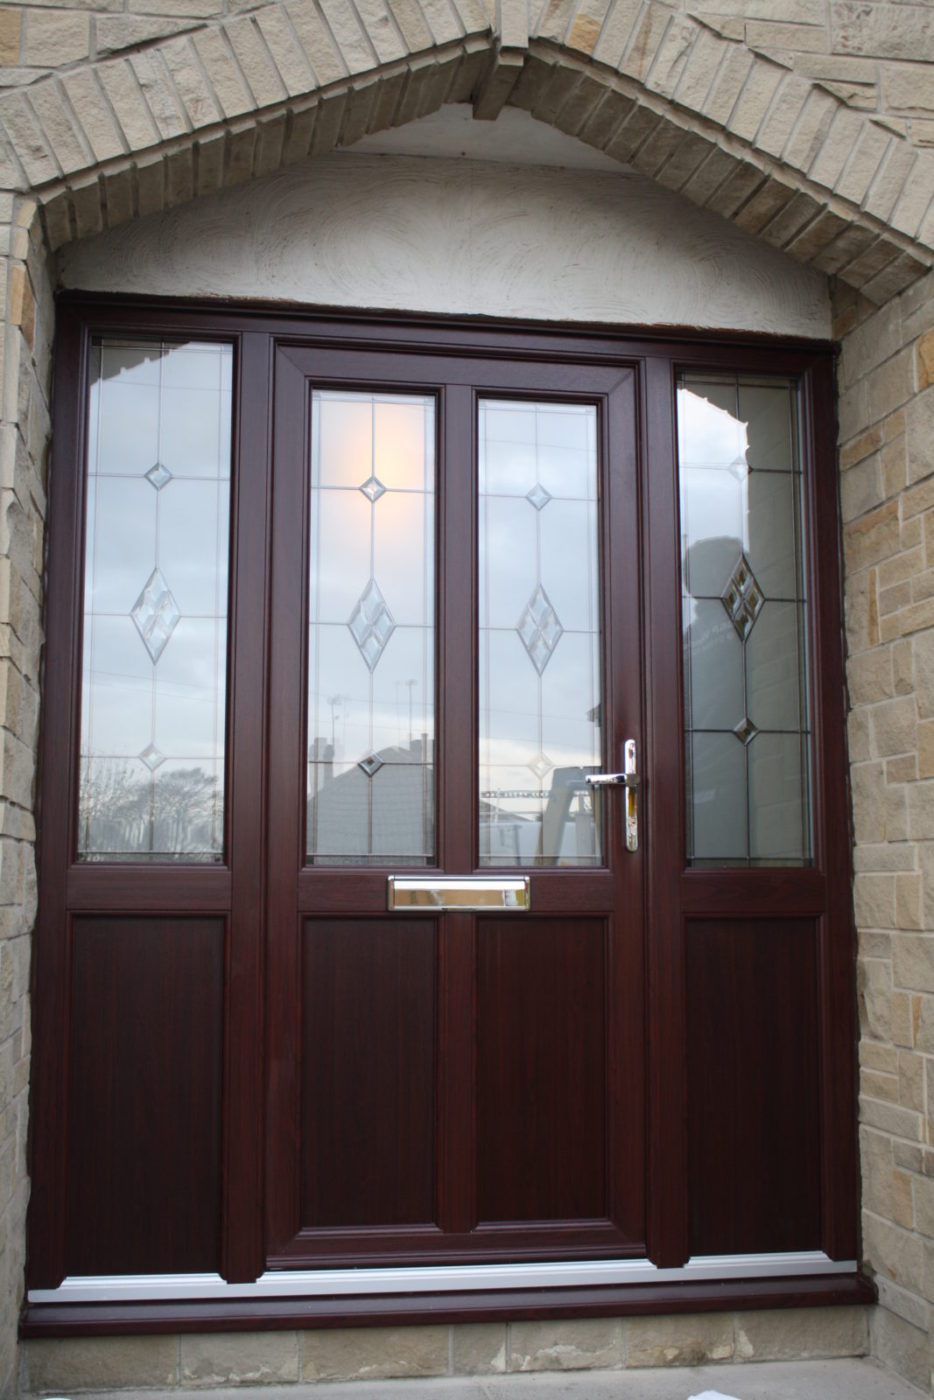 1600 #50637B Engineered Doors B & P Windows image Residential Doors And Windows 44431067